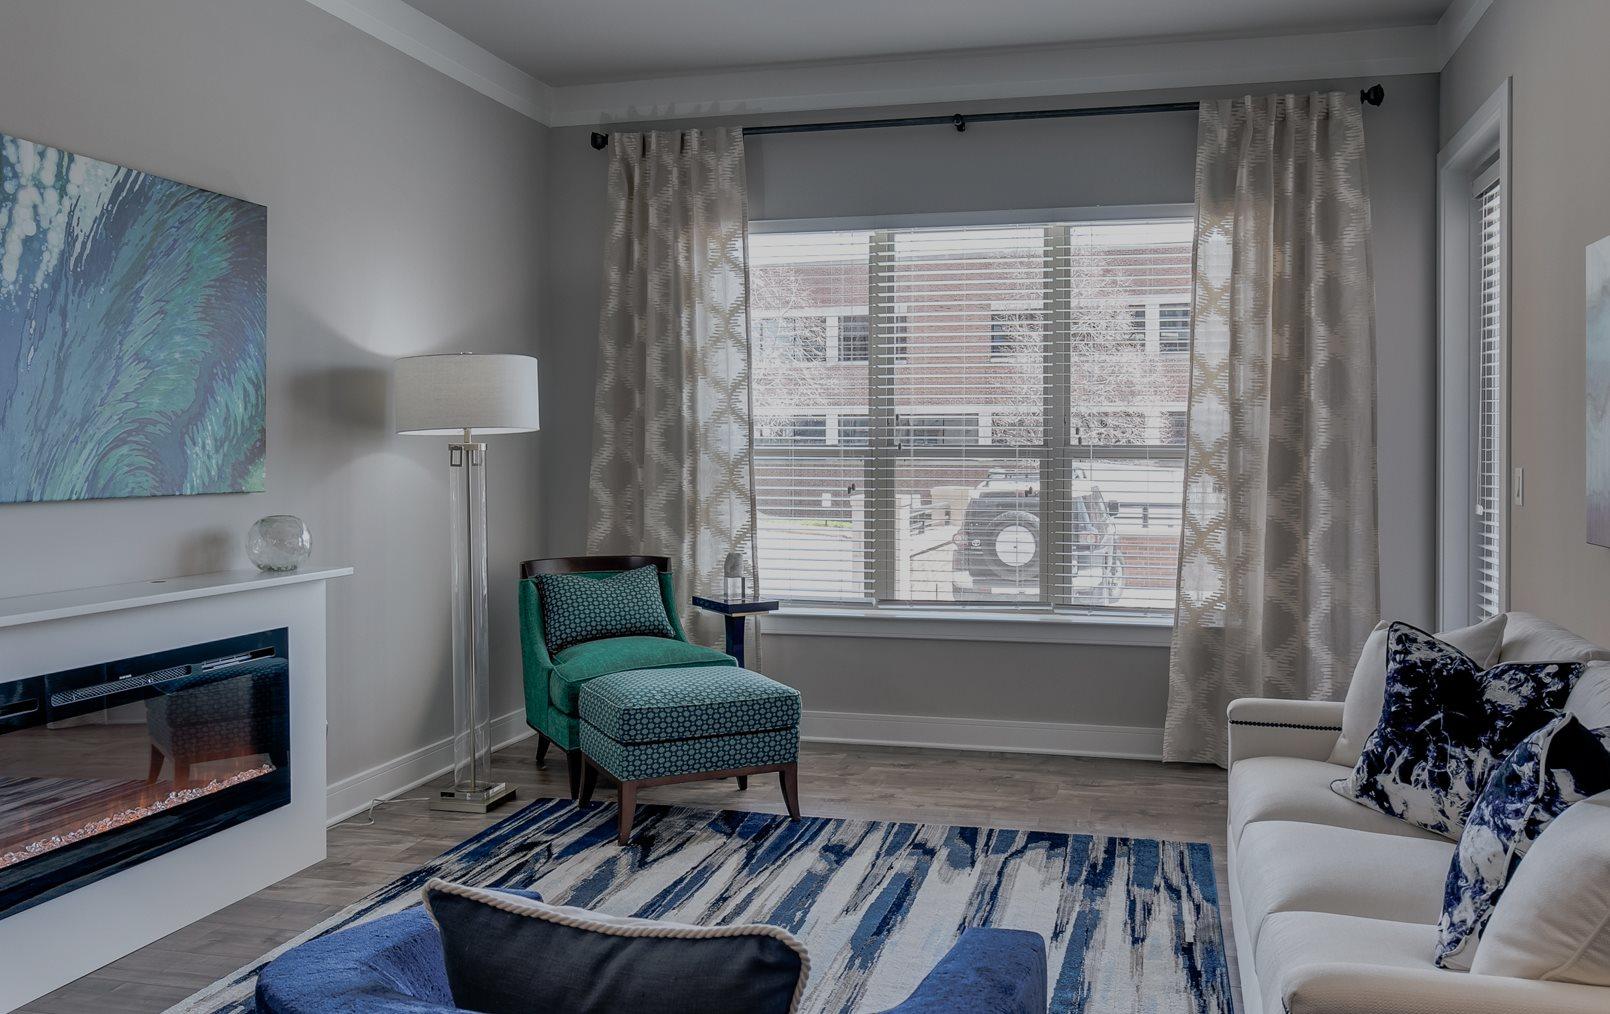 The Monarch Upscale Apartment Homes in Des Plaines, IL